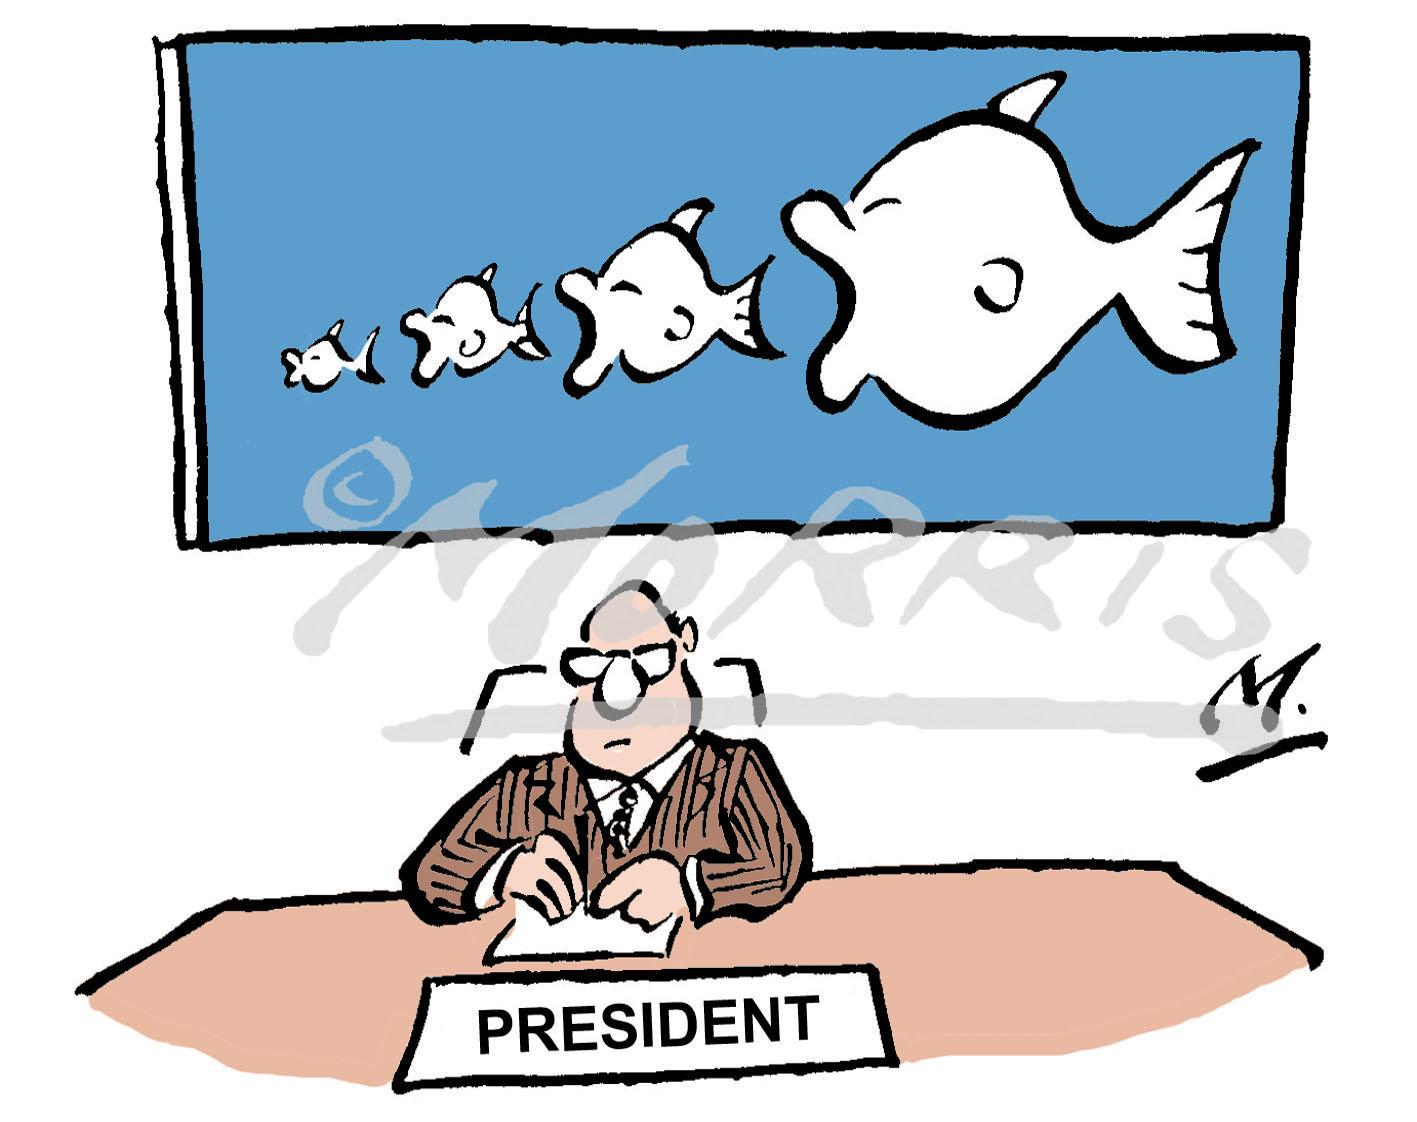 President takeover comic cartoon – Ref: 1474colus